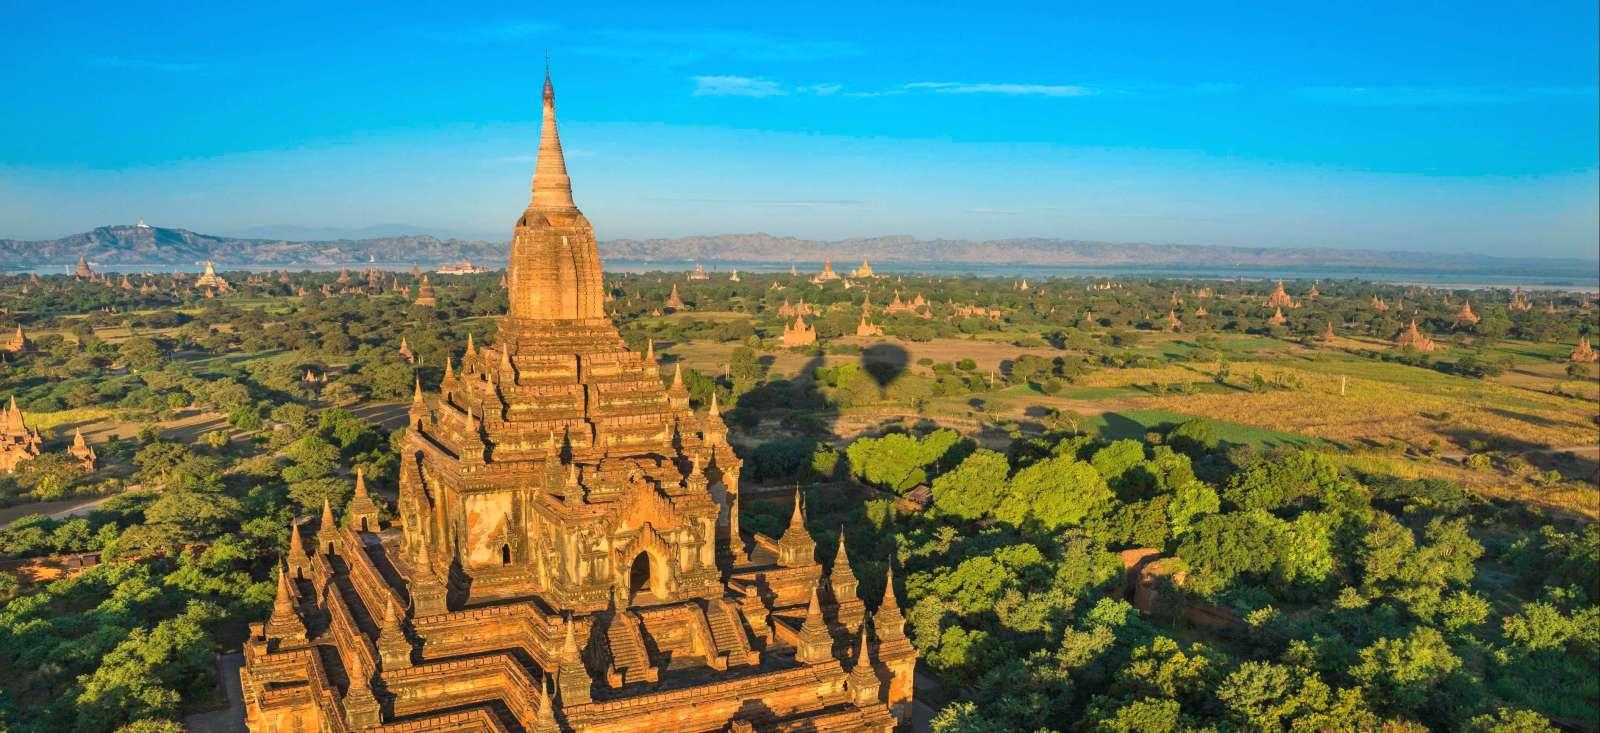 Voyage à pied : Birmanie : Balade en Terre Birmane